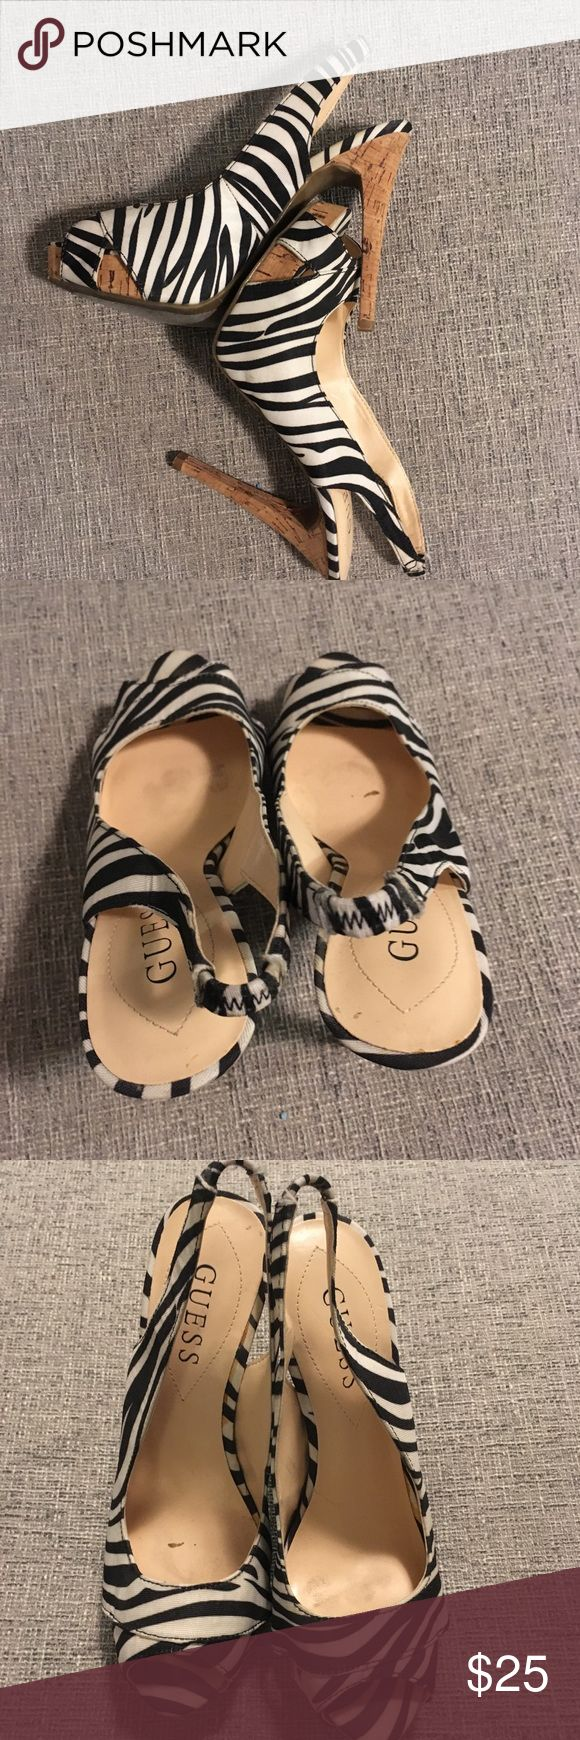 Guess Zebra heels Gently used Guess Zebra heels. Size 7. Guess Shoes Heels